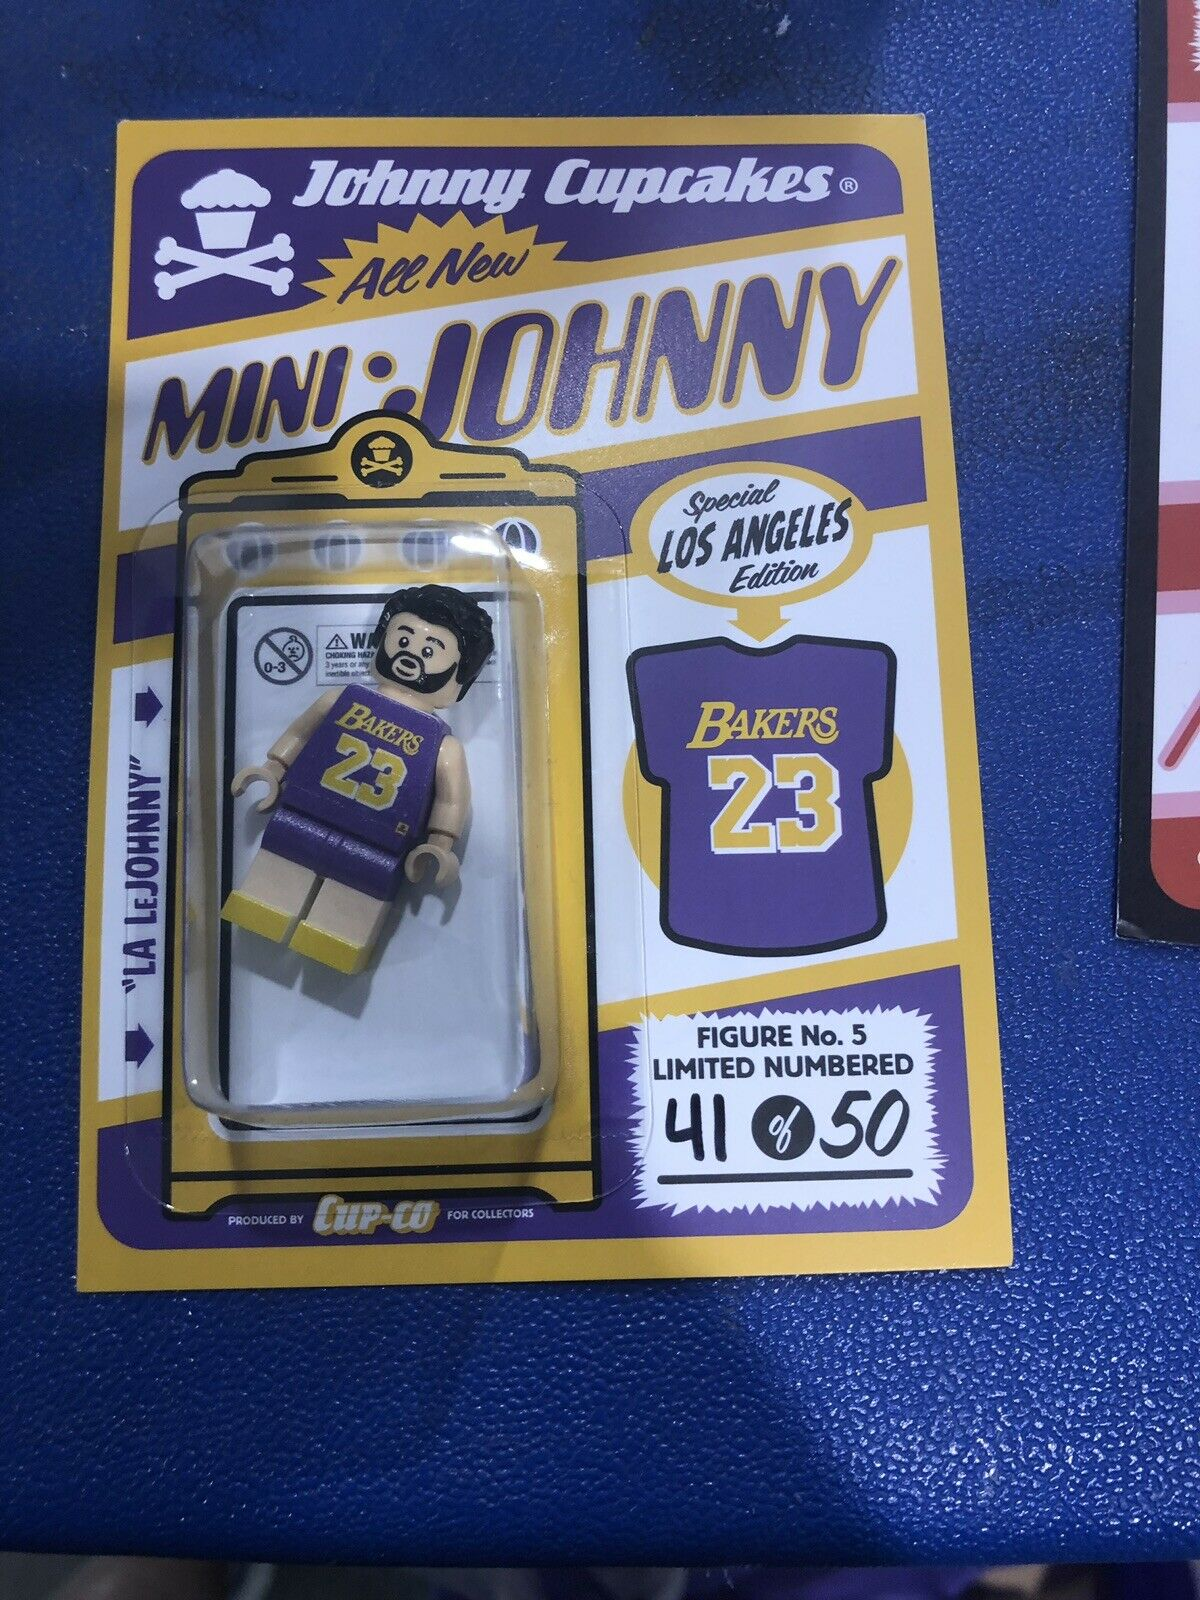 Dcon 2019 Johnny Cupcakes Mini Johnny Lakers Lego Figure   41 50 Designer Con